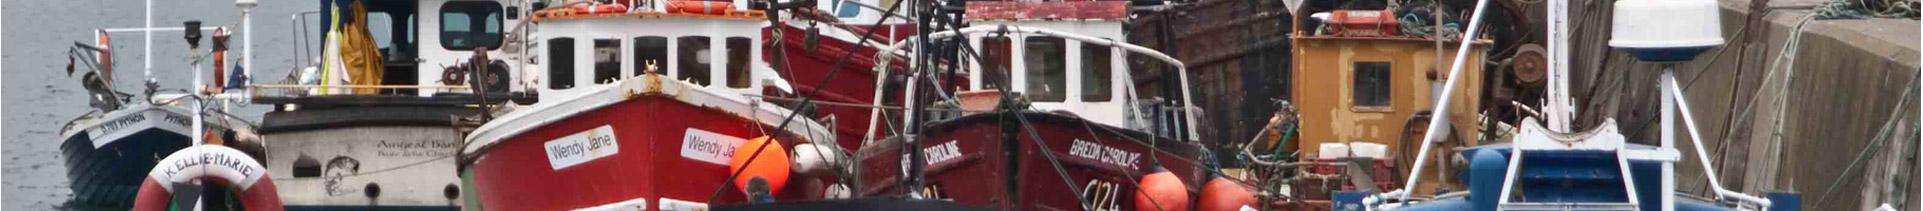 commercial_boating.jpg